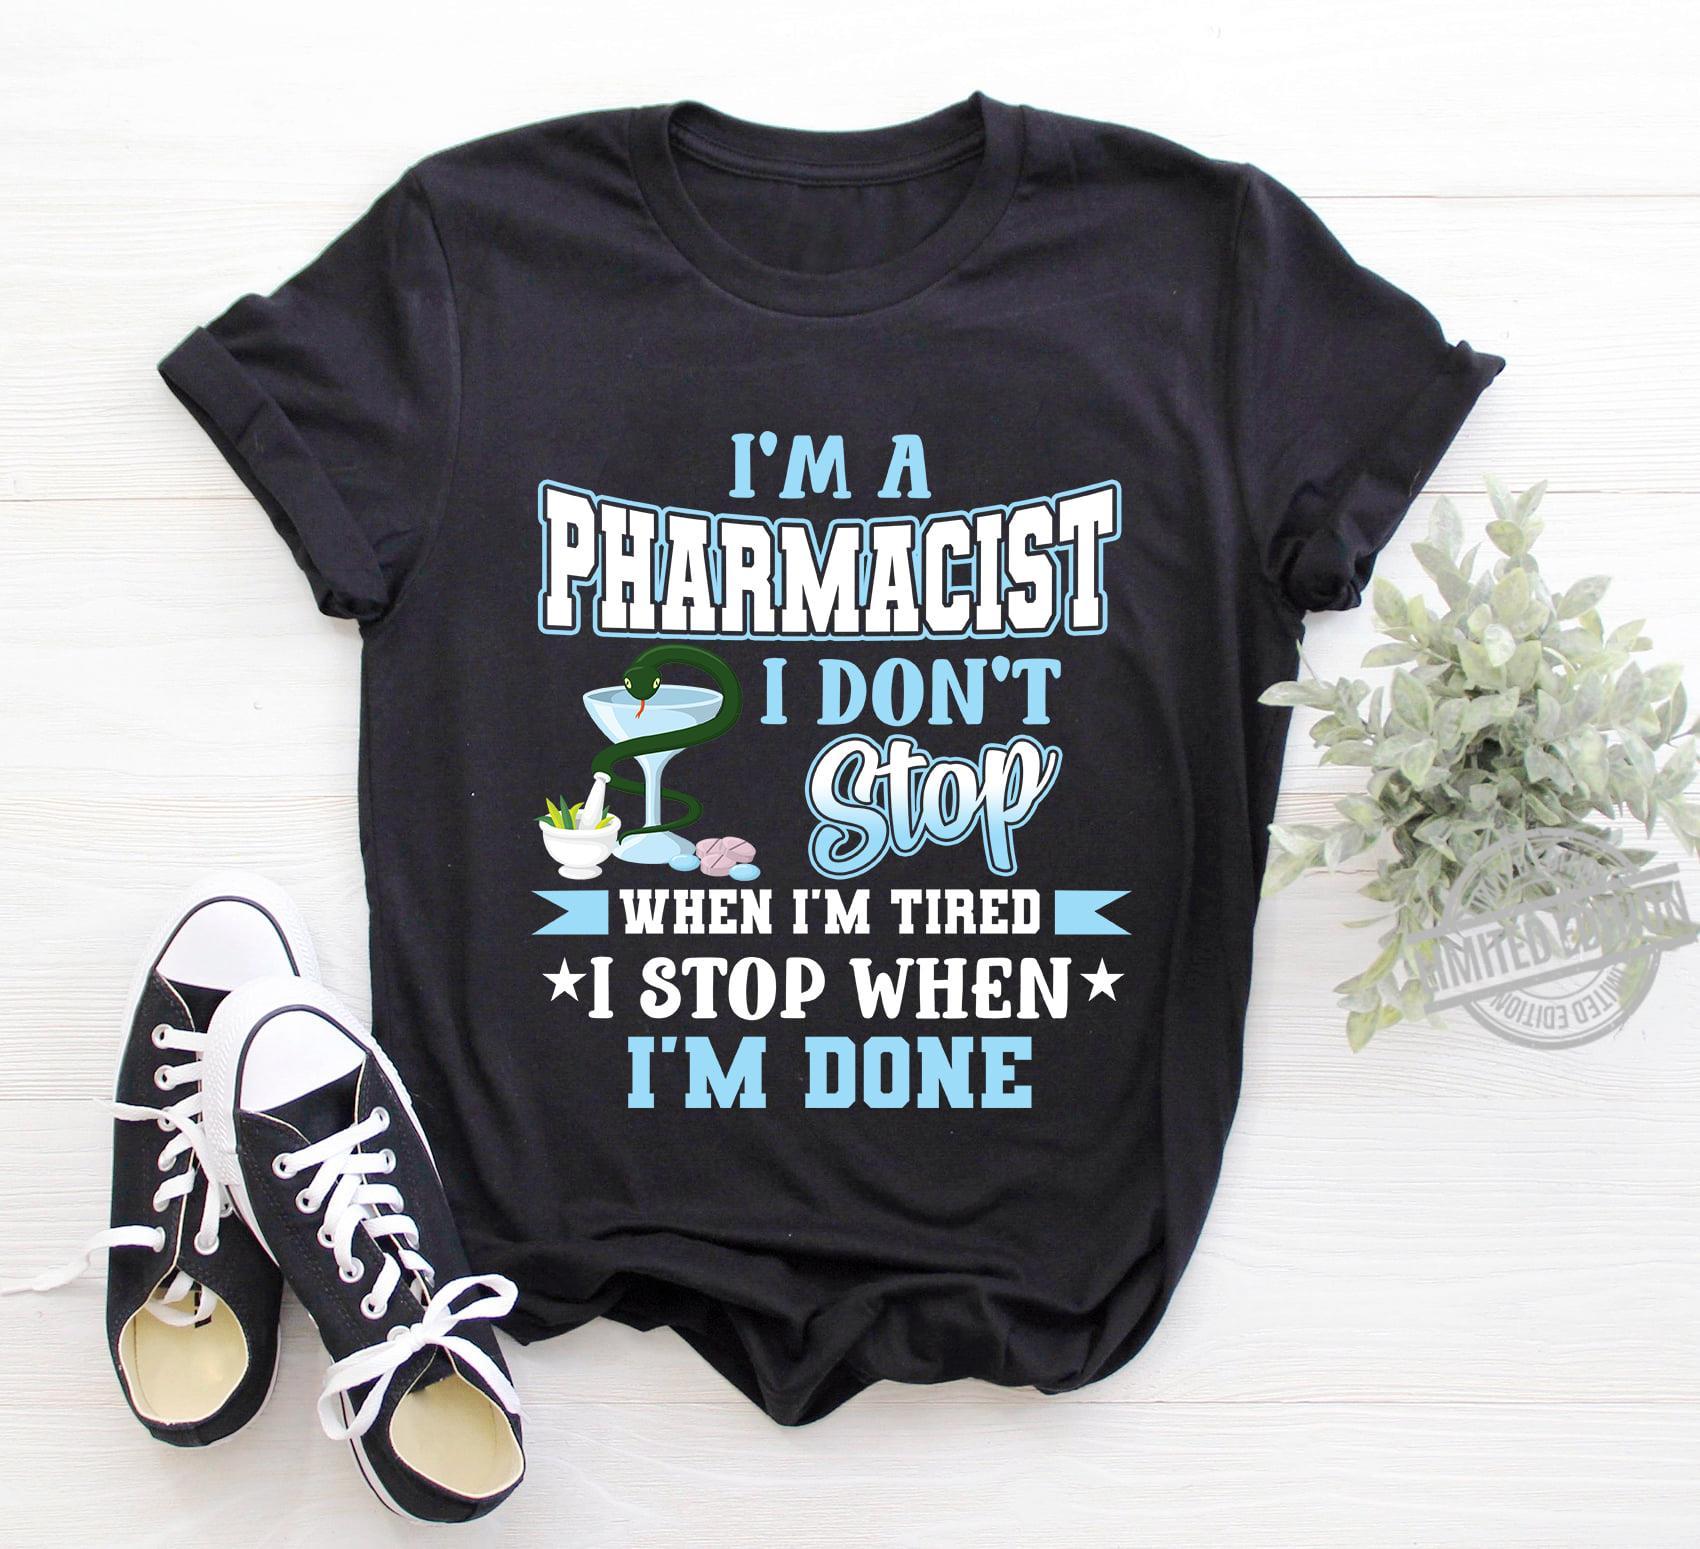 I'm A Pharmacist I Don't Stop When I'm Tired I Stop When I'm Done Women Jersey Tank Top